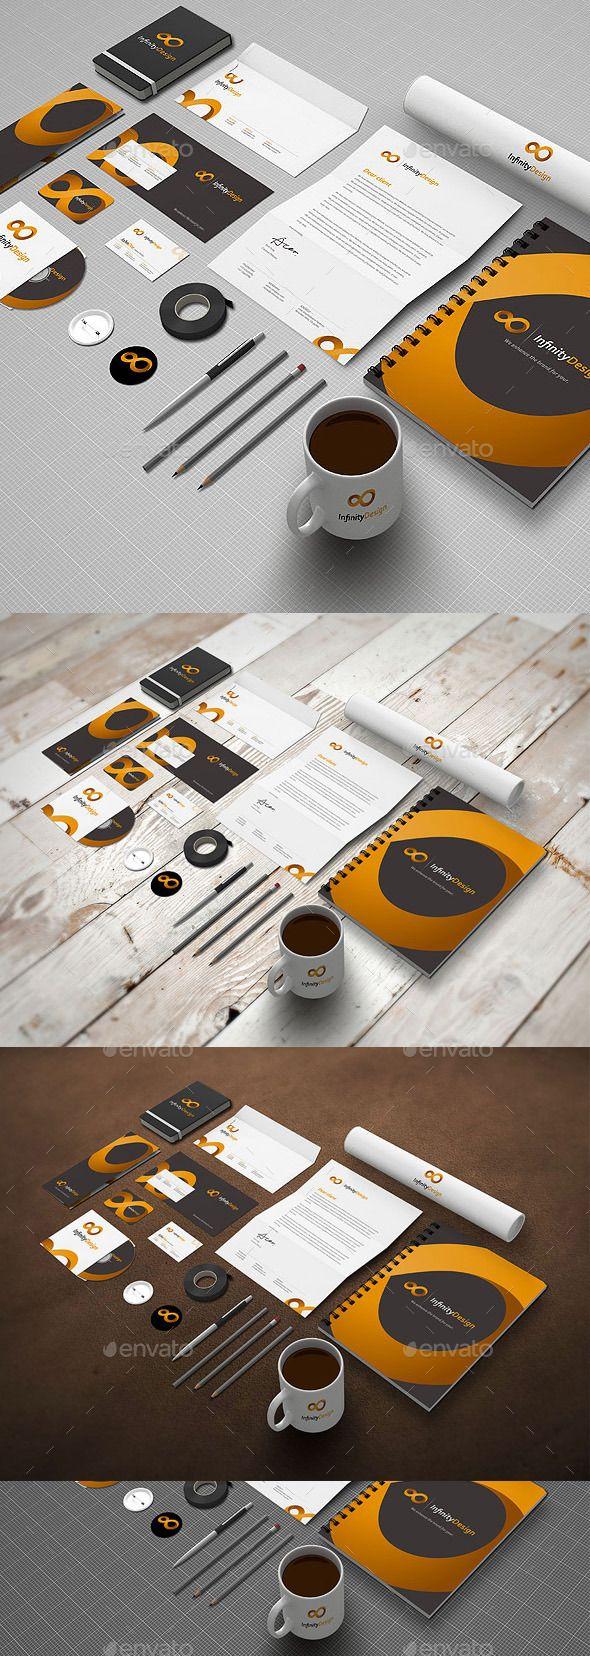 Photo Realistic Stationery Mock-Up #design Download: http://graphicriver.net/item/photo-realistic-stationery-mockup/12693295?ref=ksioks